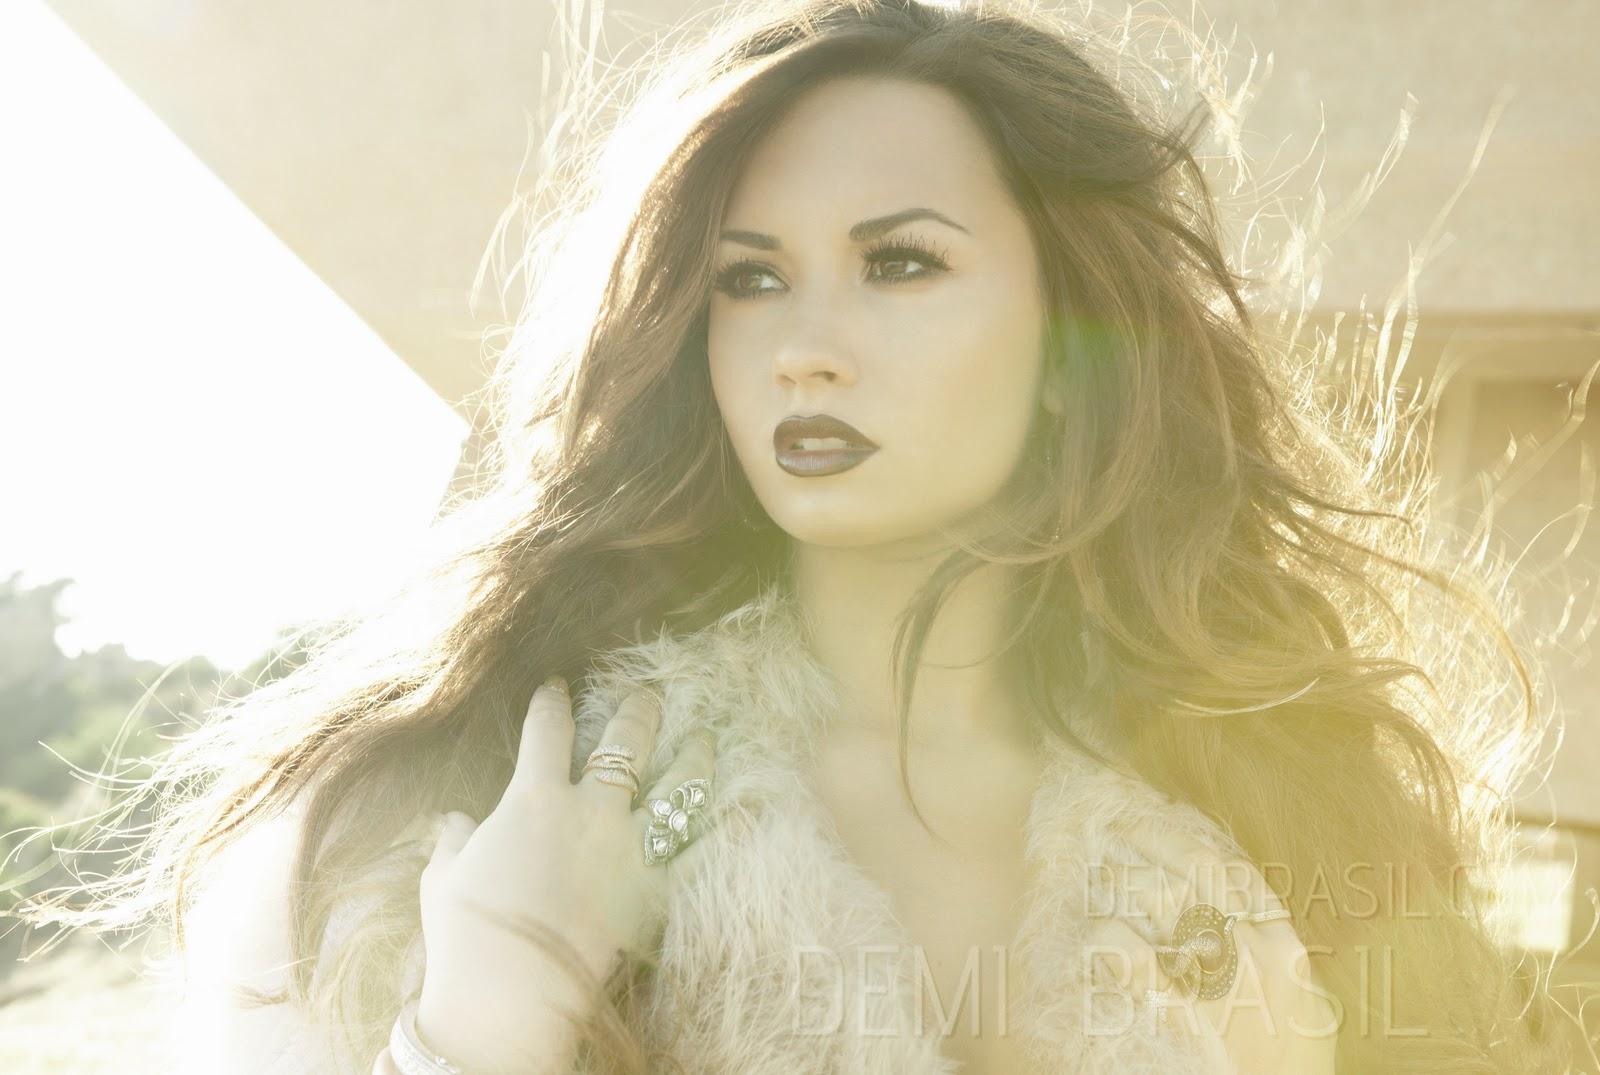 http://3.bp.blogspot.com/-aDcKwidpQdk/TysV-_omwUI/AAAAAAAABmk/sS0ZU9i85TA/s1600/Demi+Lovato+-+H+Walsh+%2528Unbroken+Promoshoot%2529+5.jpg